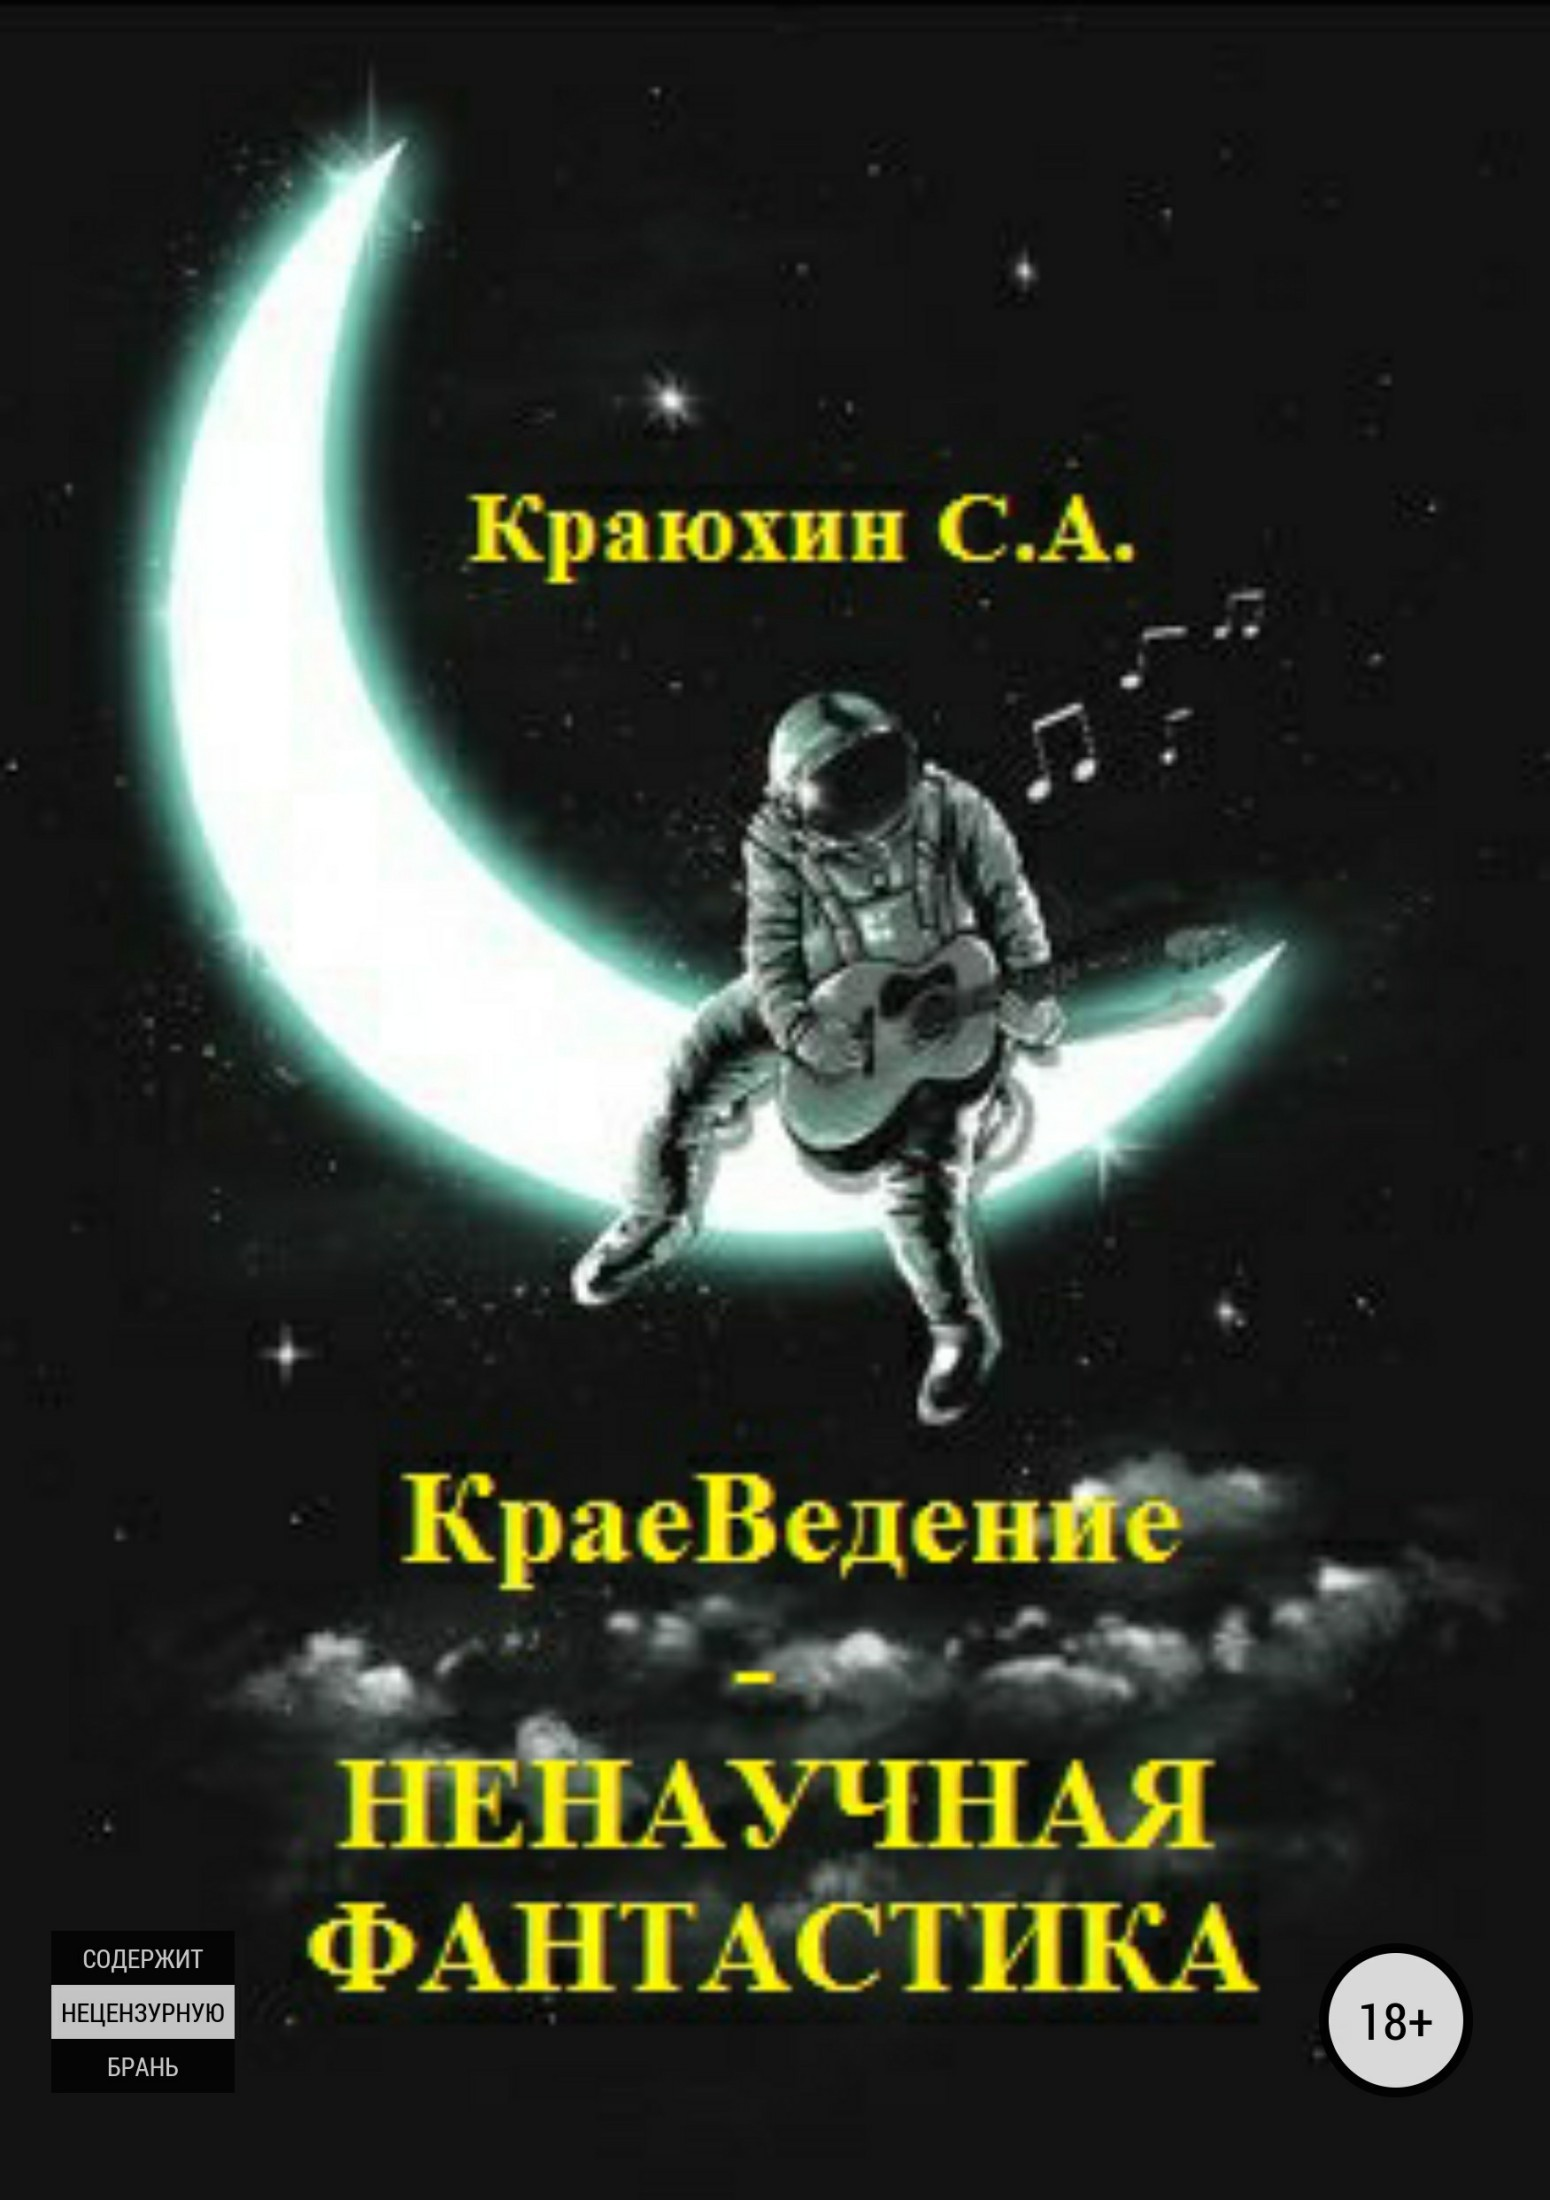 Сергей Александрович Краюхин КраеВедение – Ненаучная фантастика сергей александрович краюхин крайняя поэзия